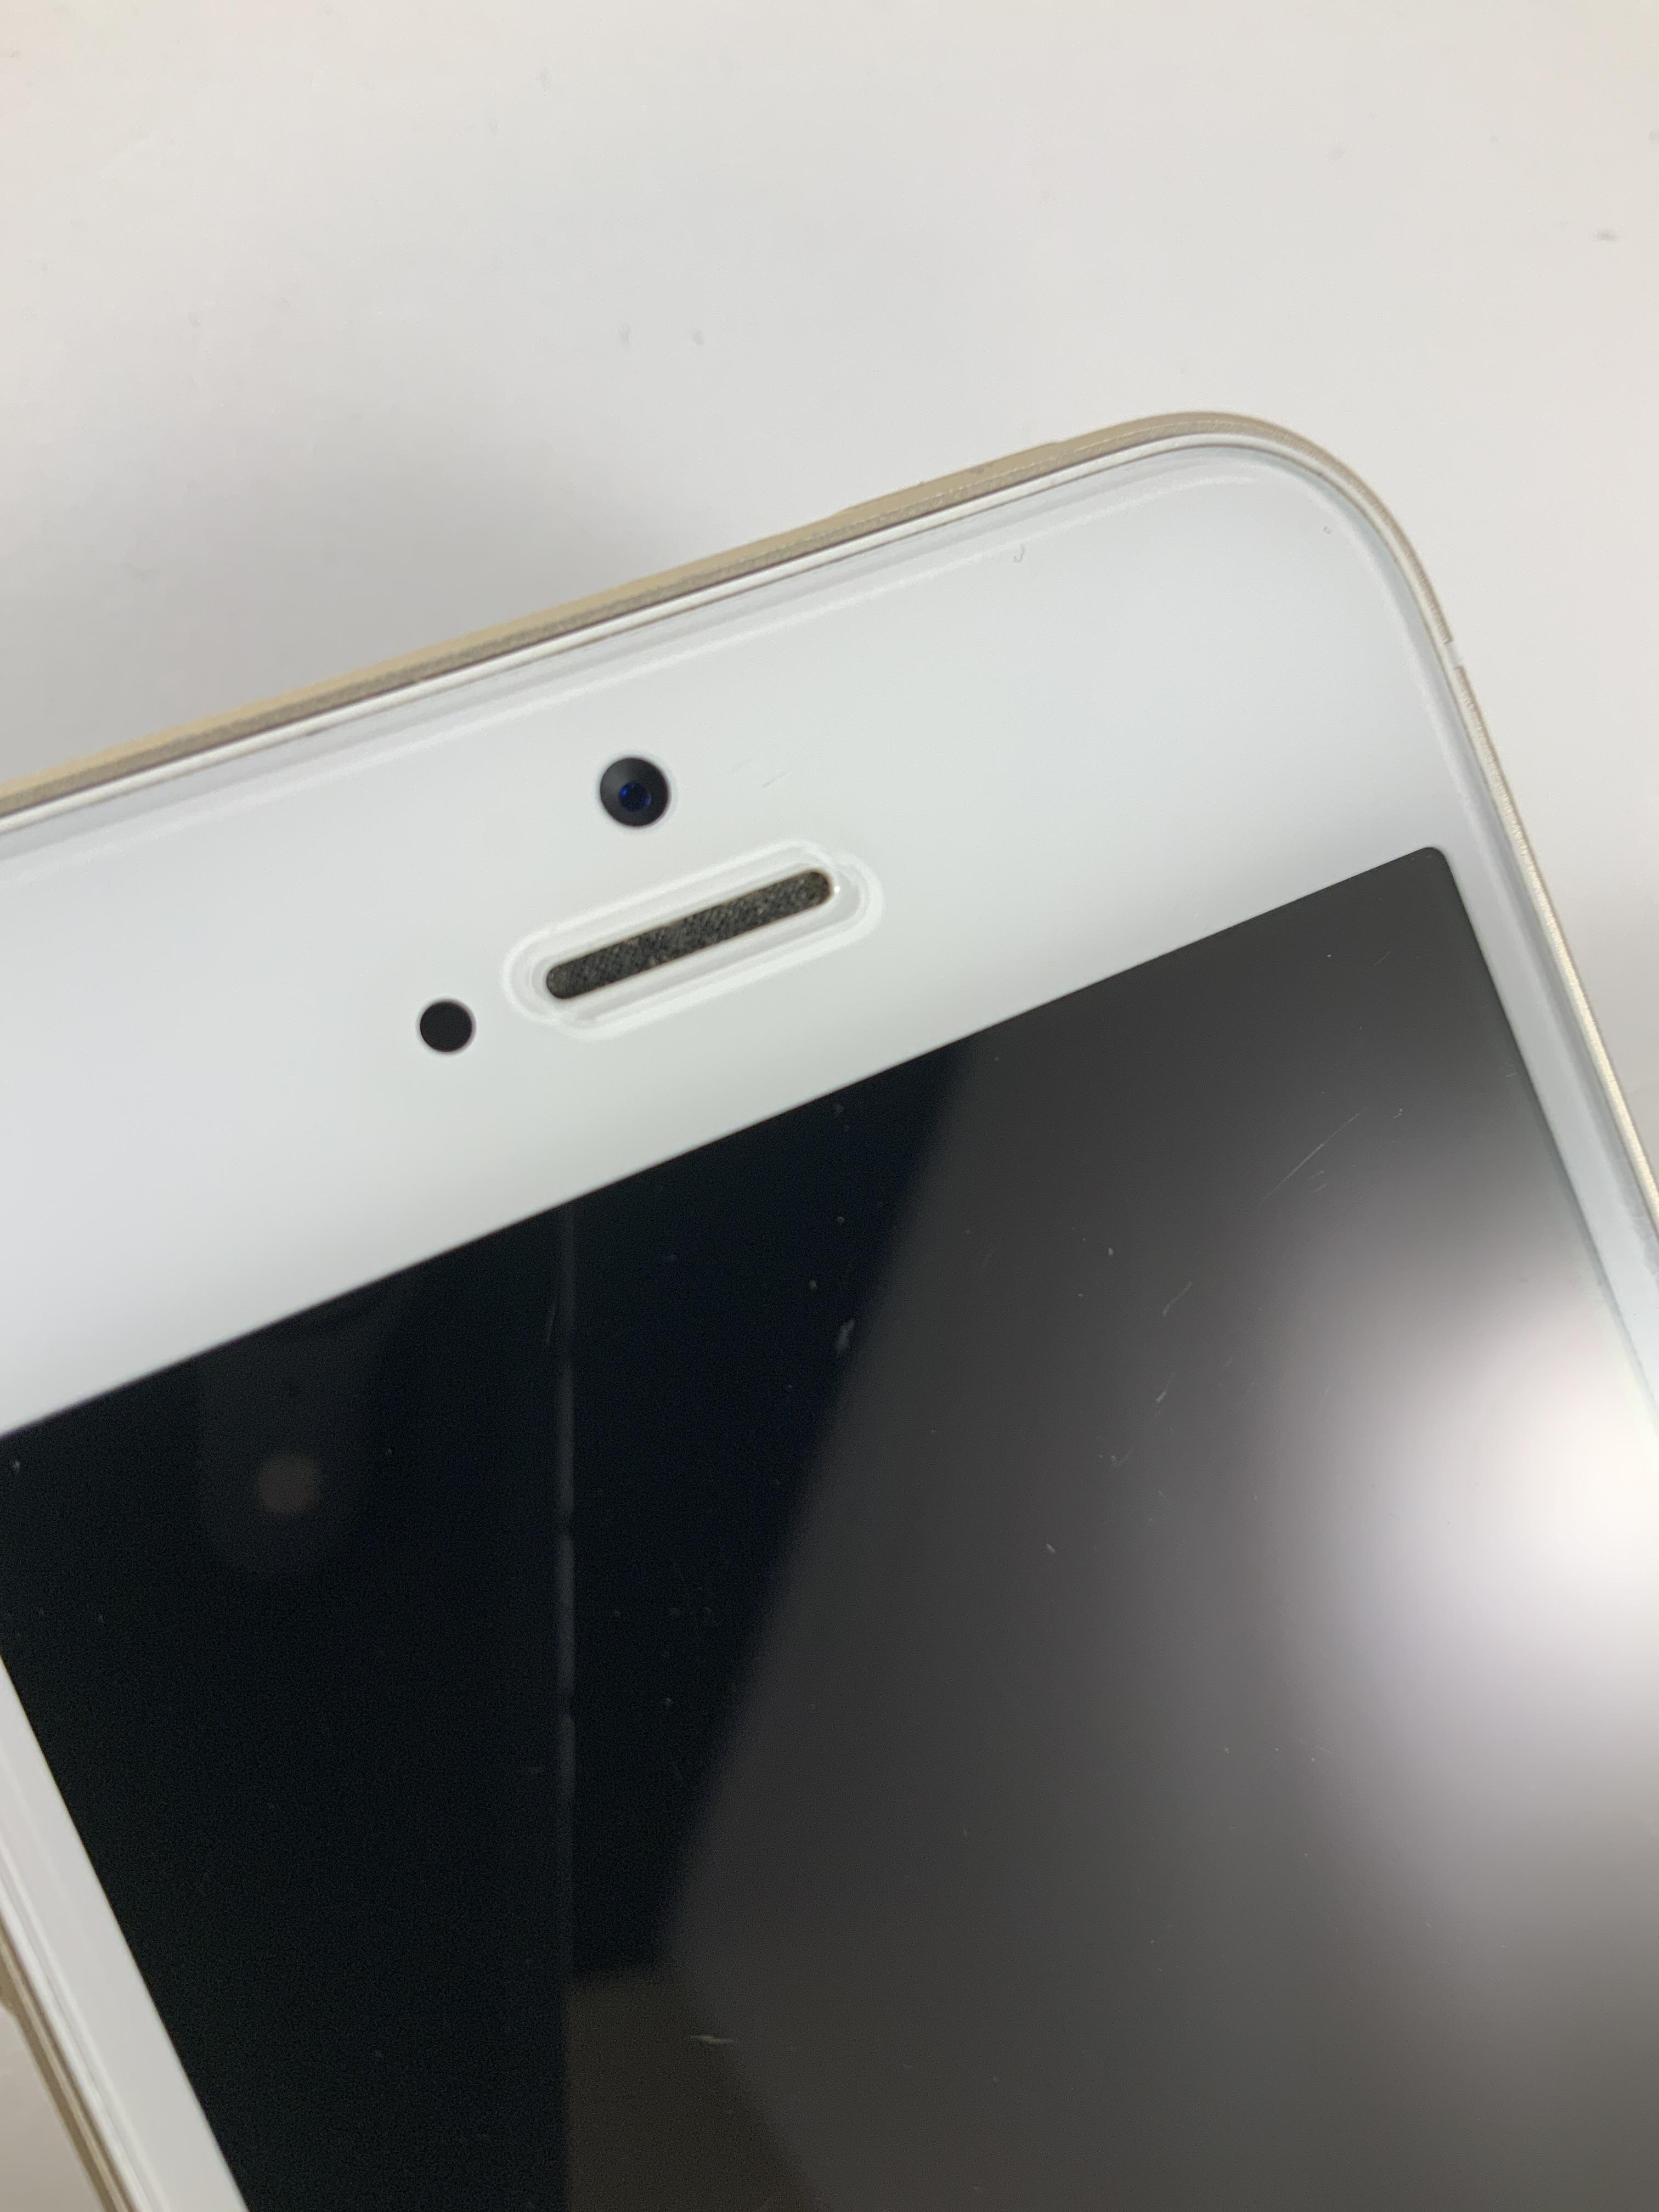 iPhone SE 16GB, 16GB, Gold, Kuva 4